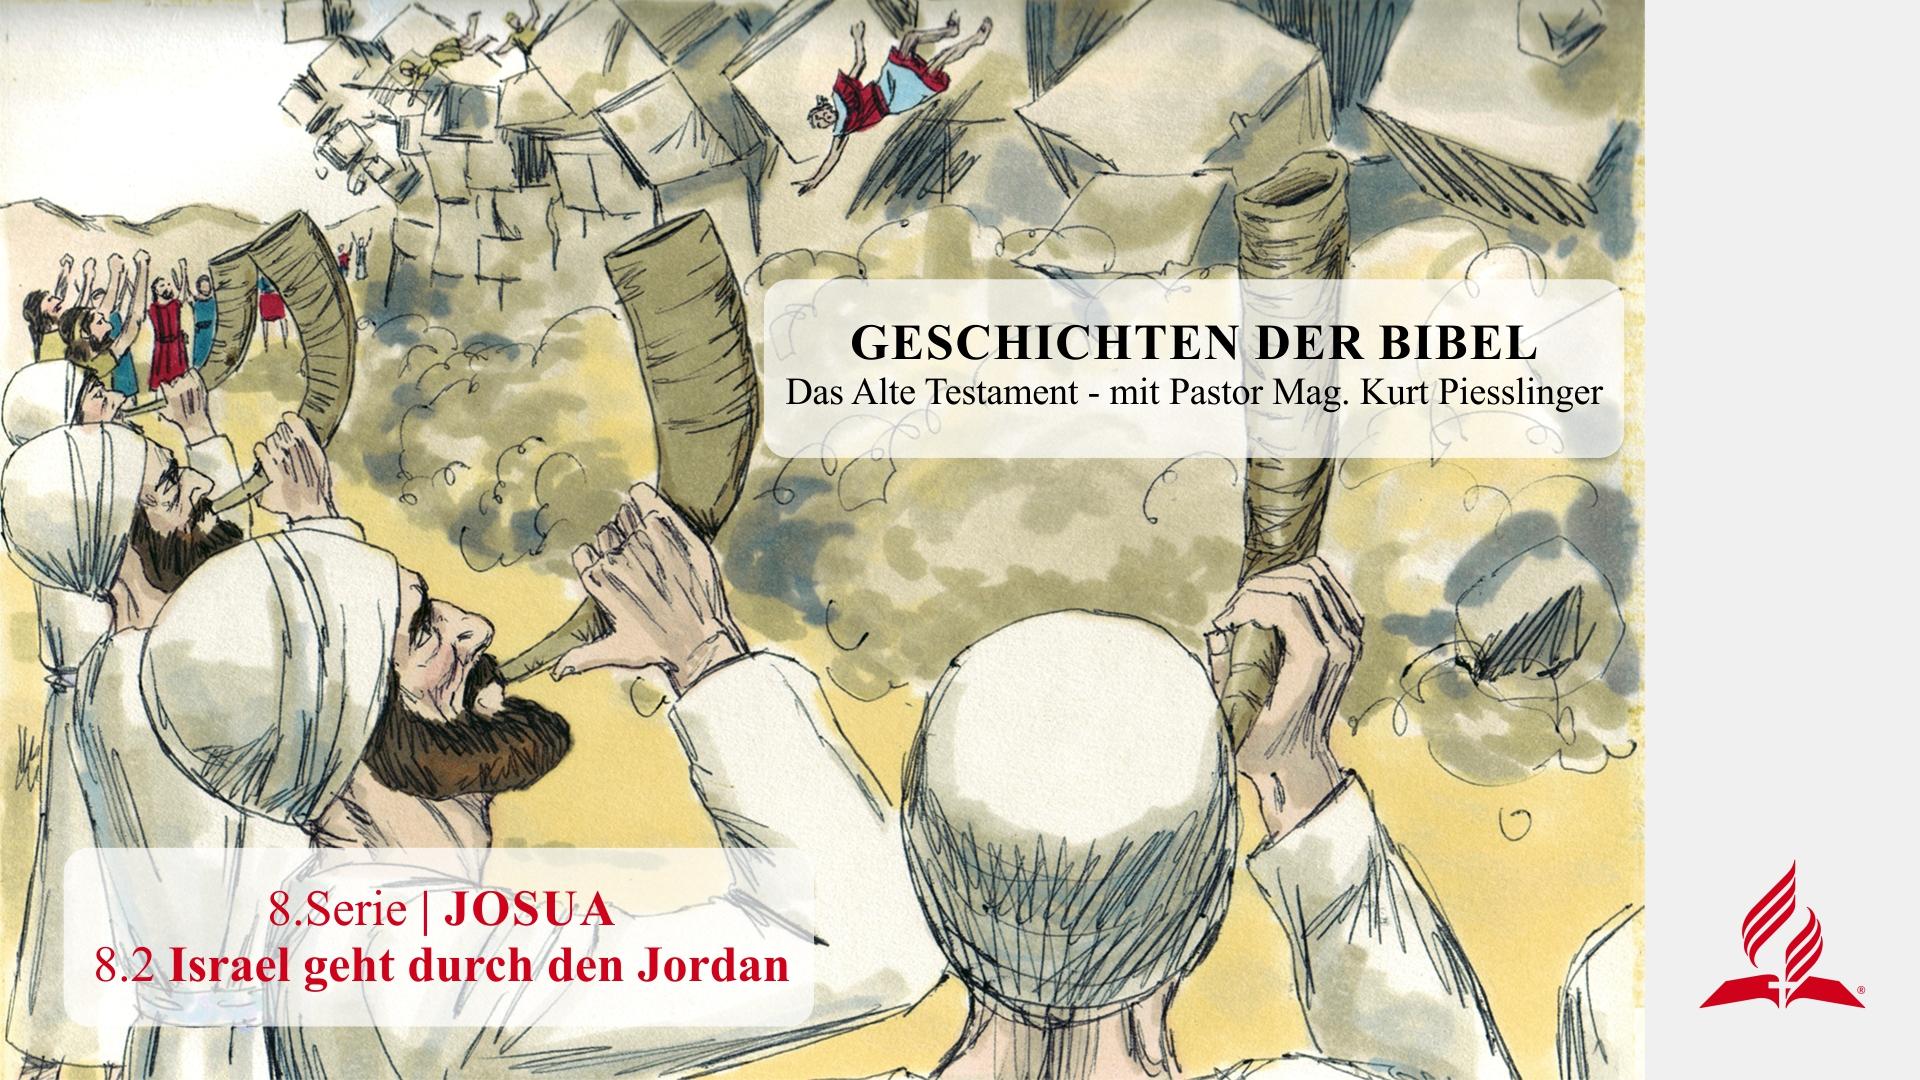 8.2 Israel geht durch den Jordan x